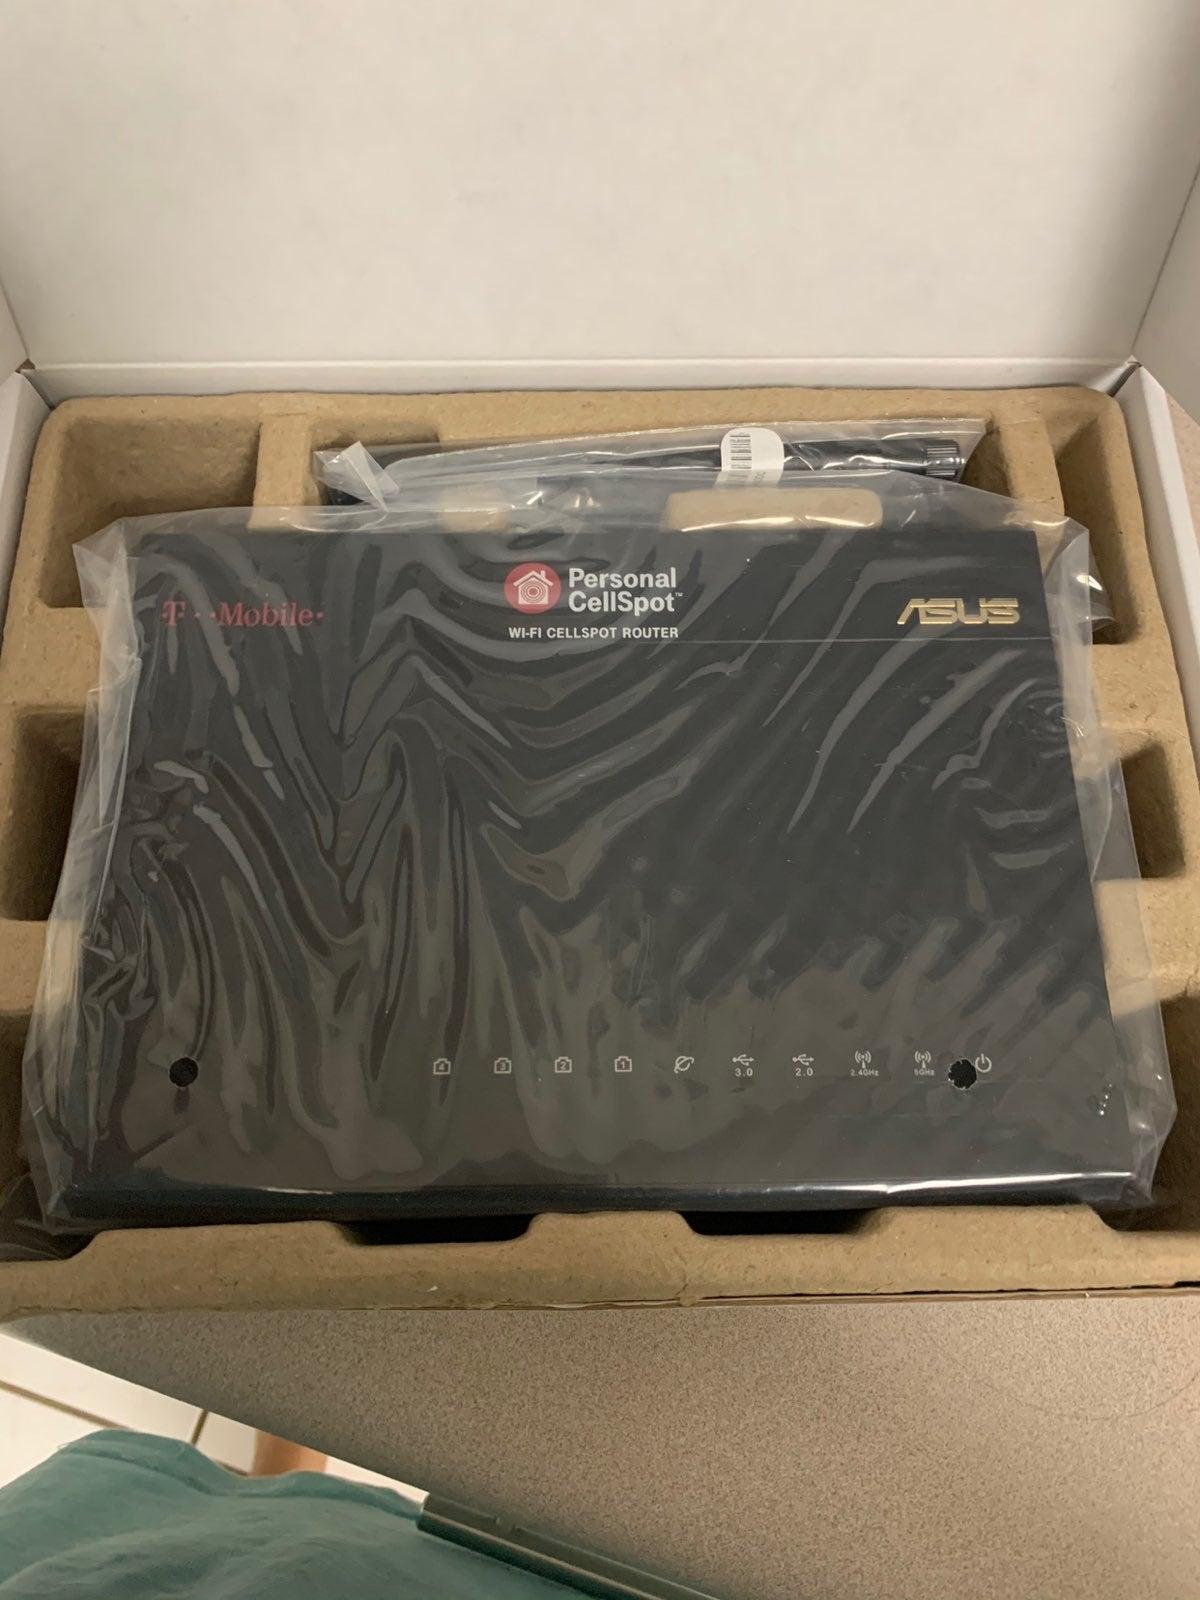 T-mobile cellspot router